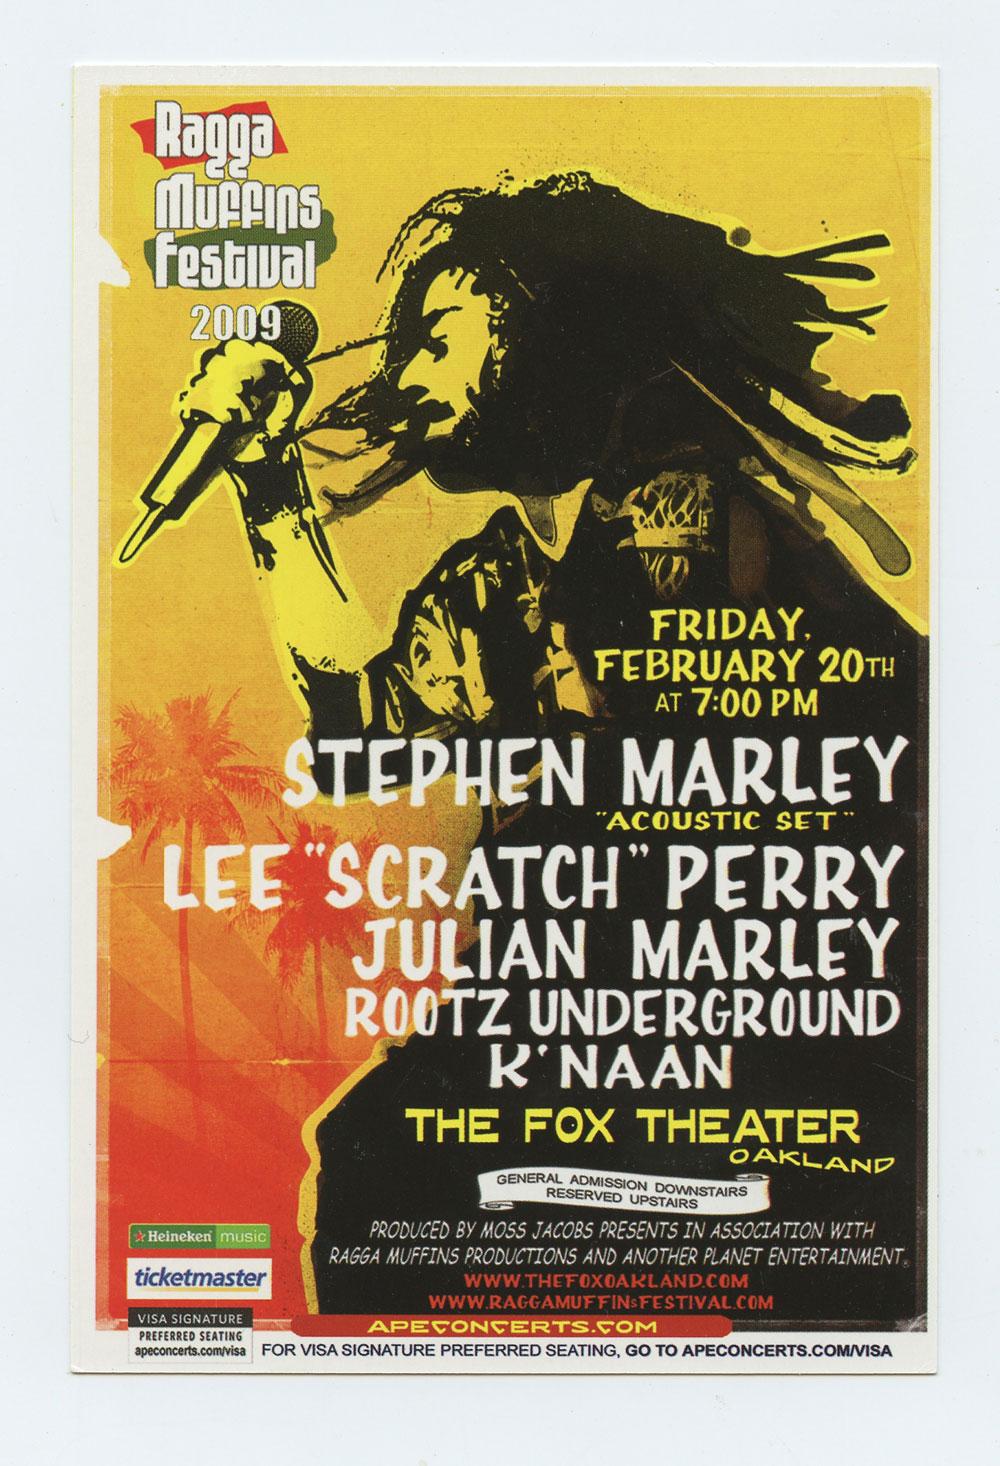 Stephen Marley Handbill Reggae Muffins Festival 2009 Feb 20 Oakland